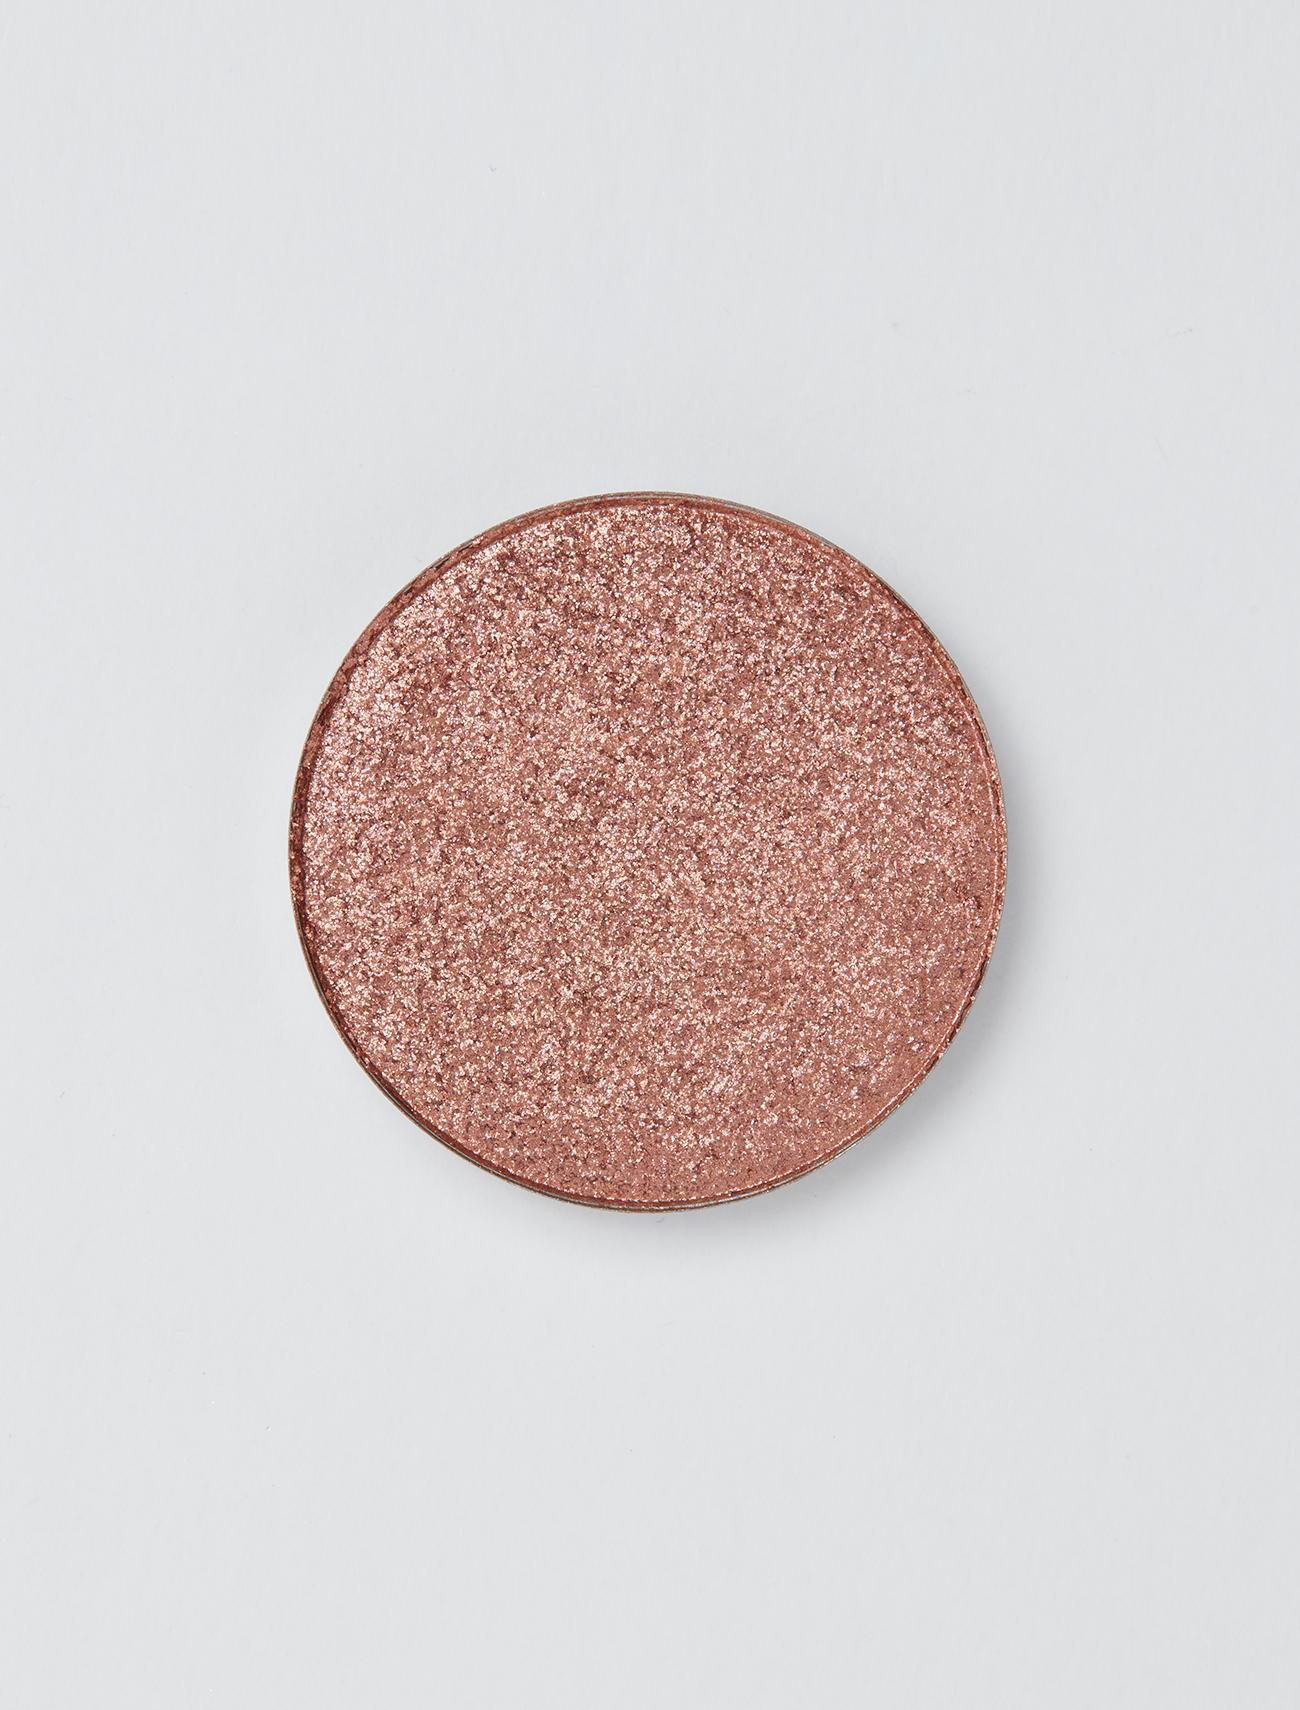 Kylie Cosmetics Eyeshadow Single